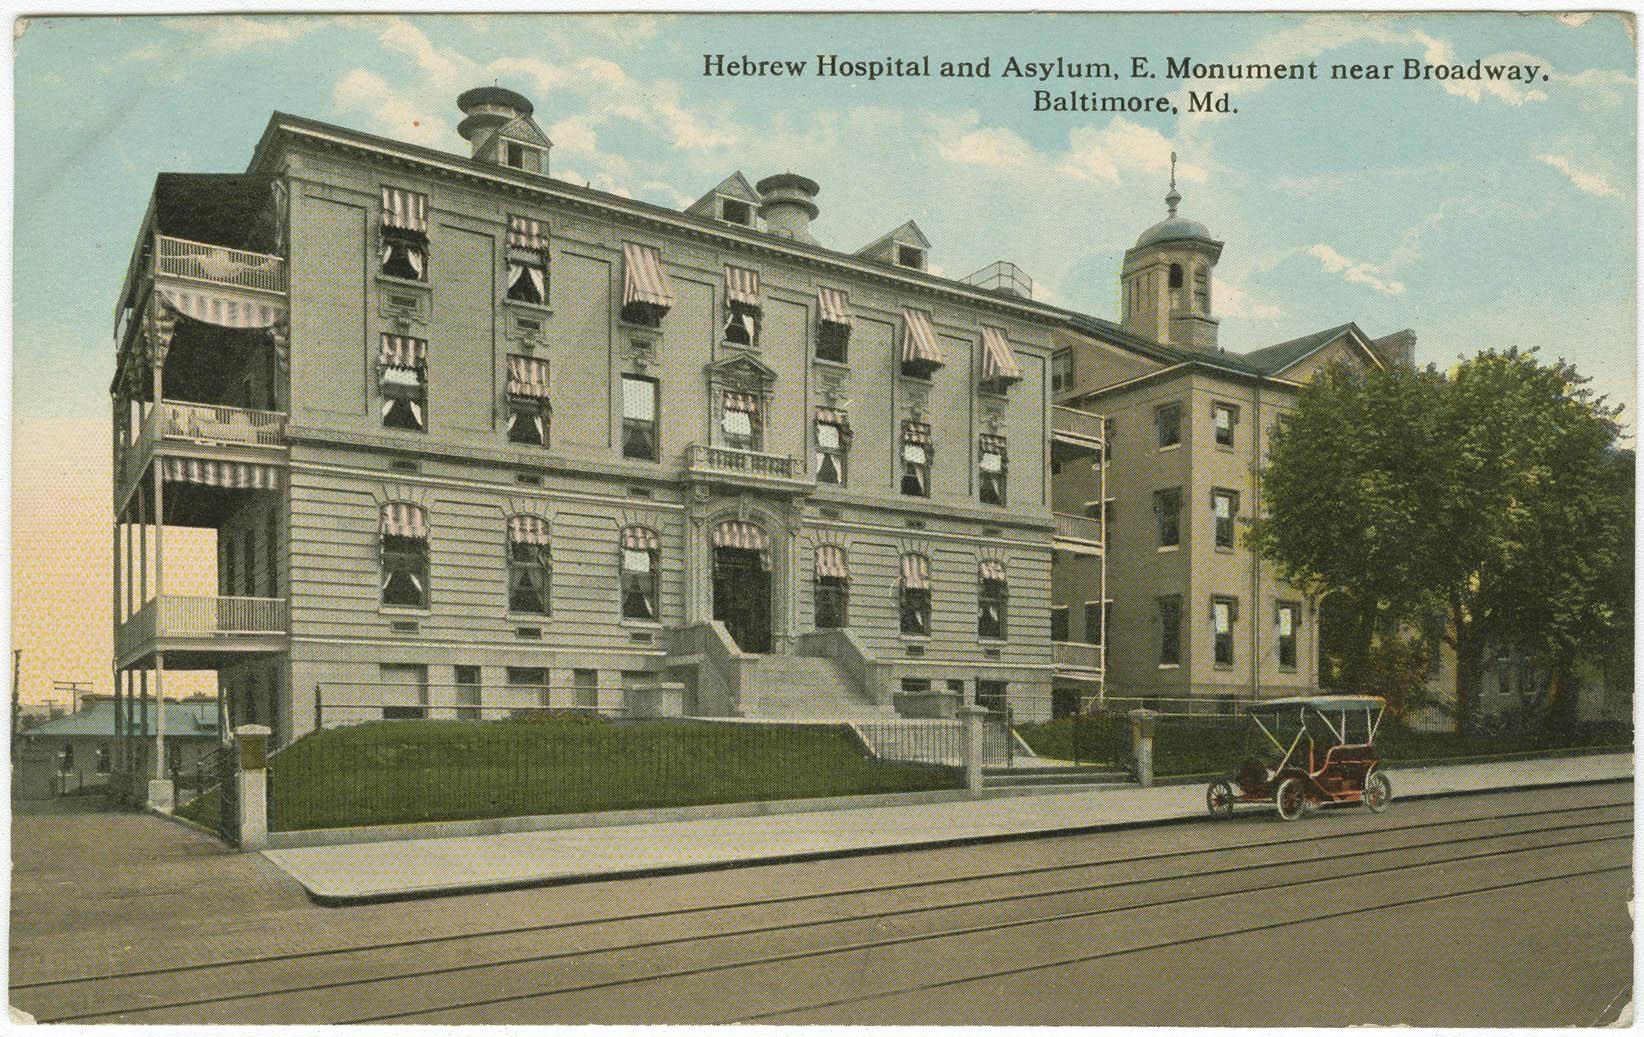 Hebrew Hospital and Asylum, E. Monument near Broadway. Baltimore, Md.